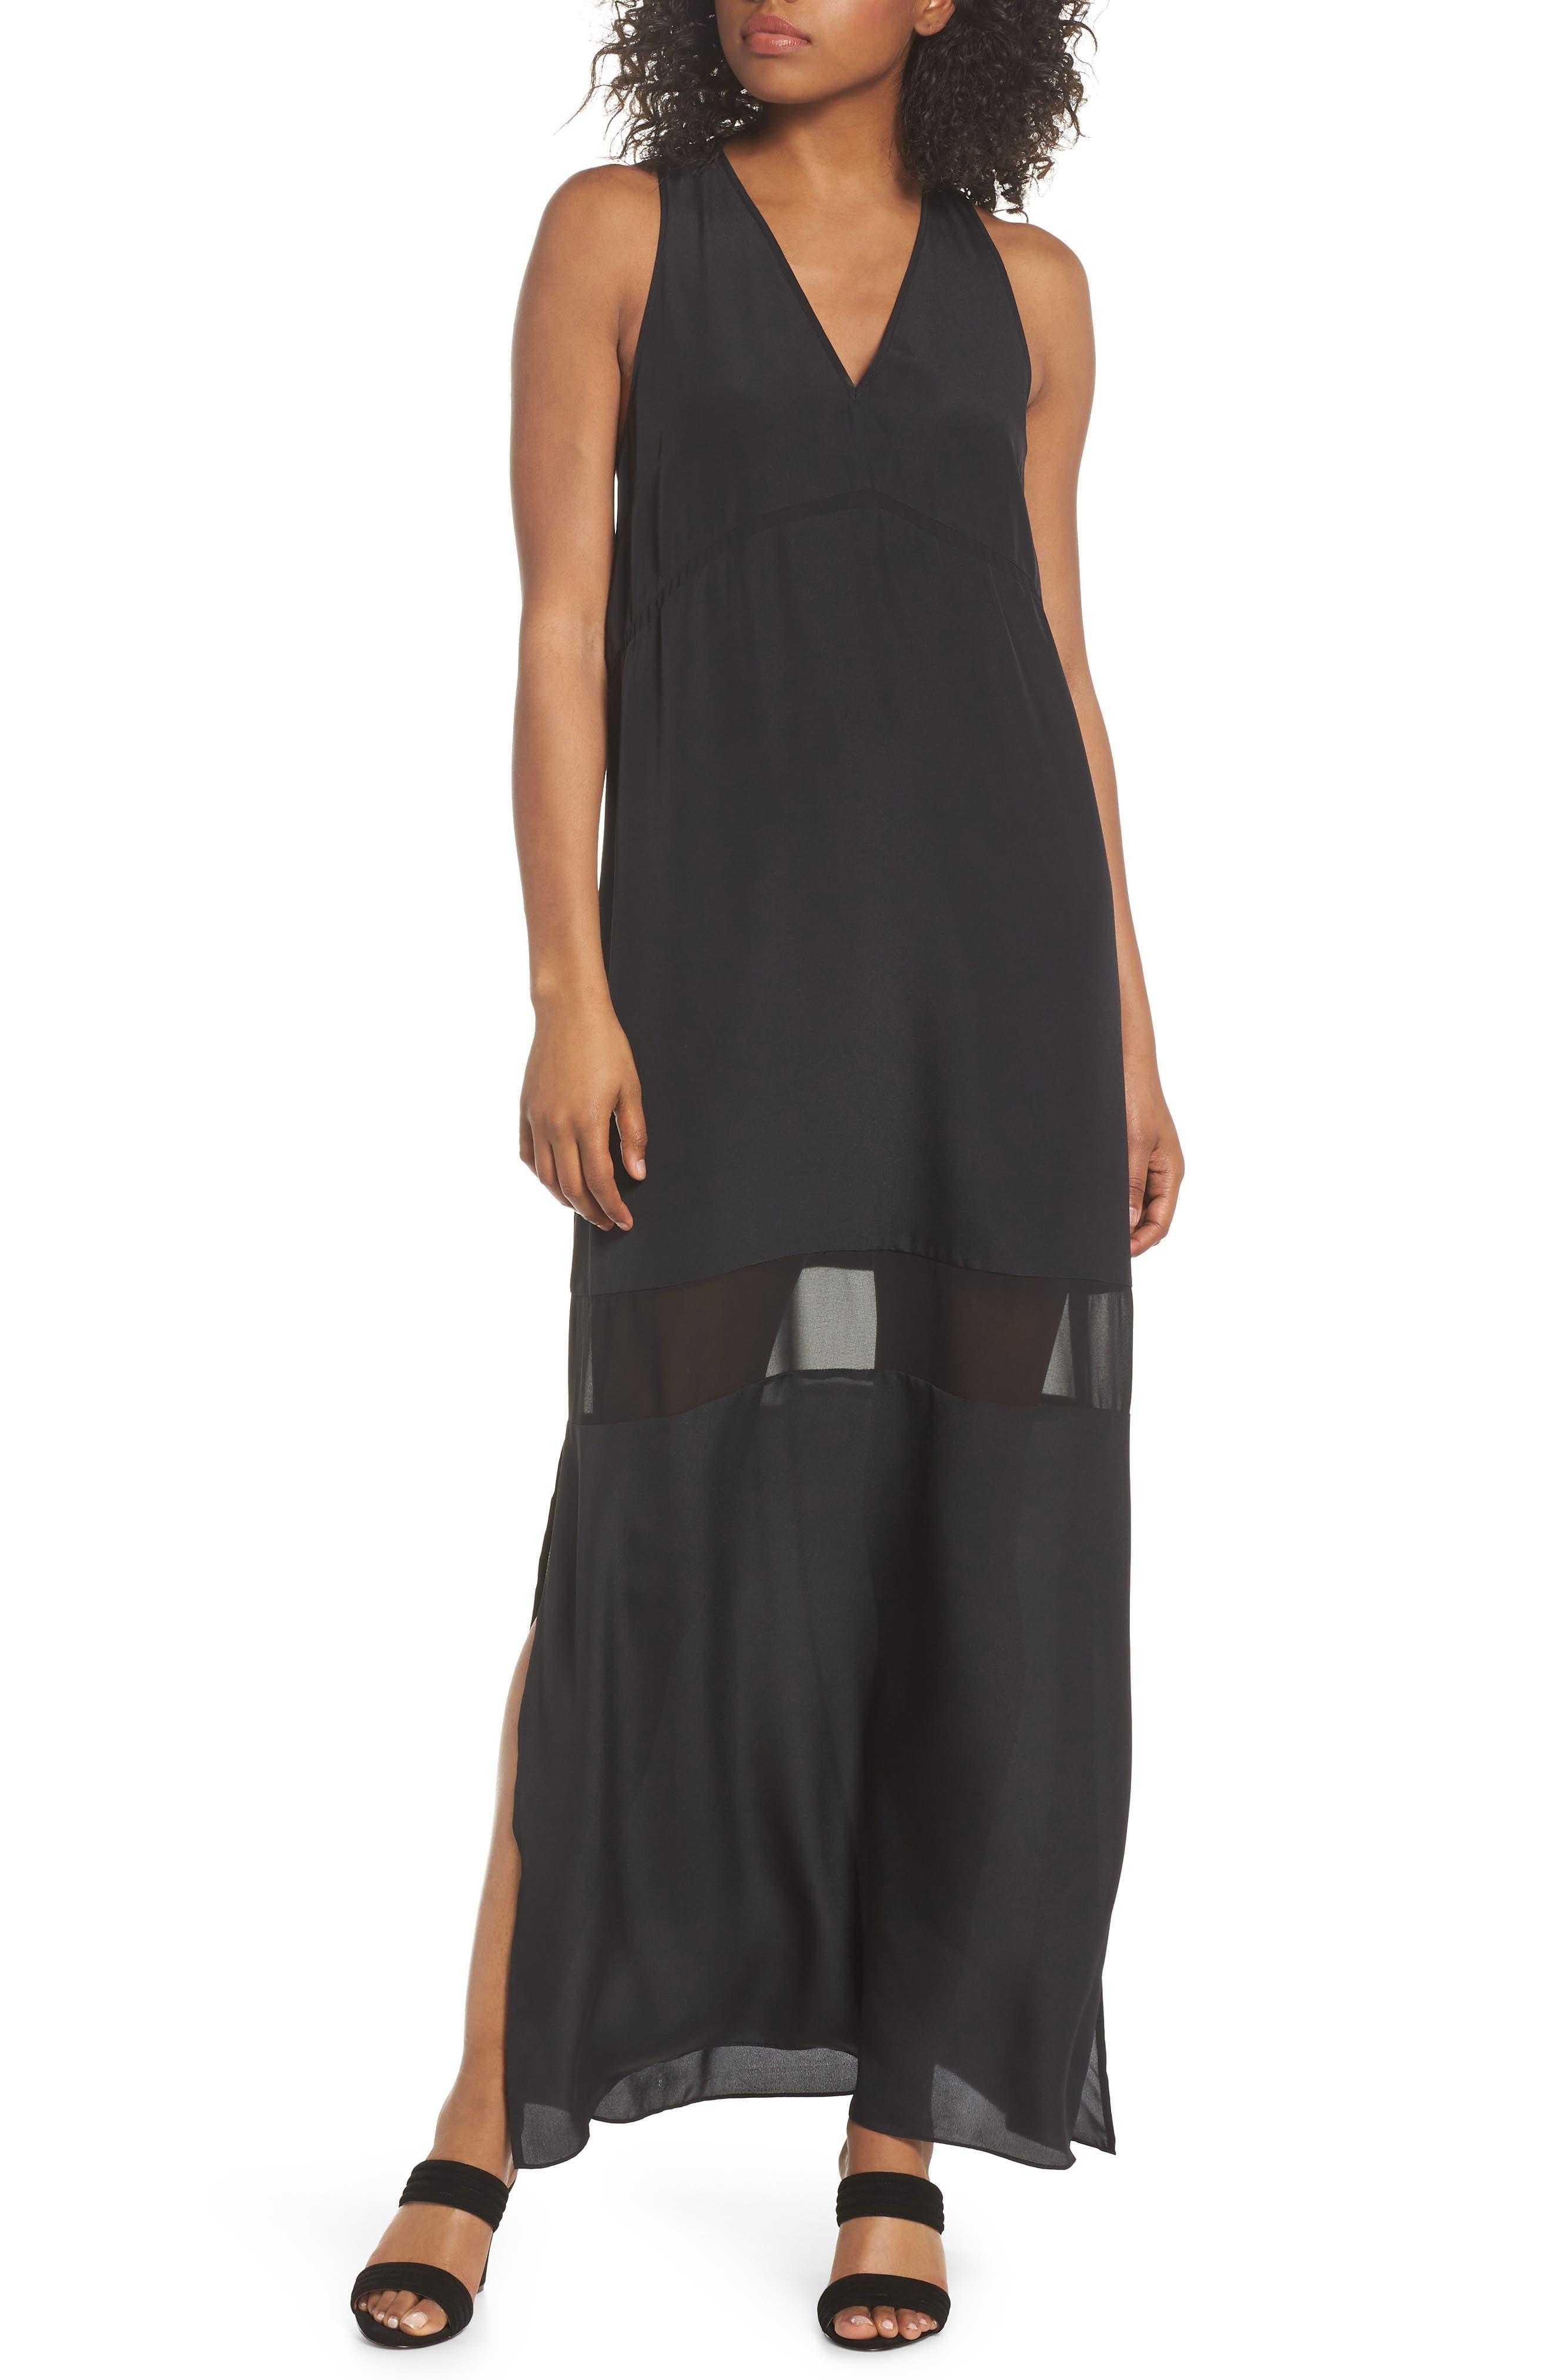 Felicity & Coco Hampton Maxi Dress